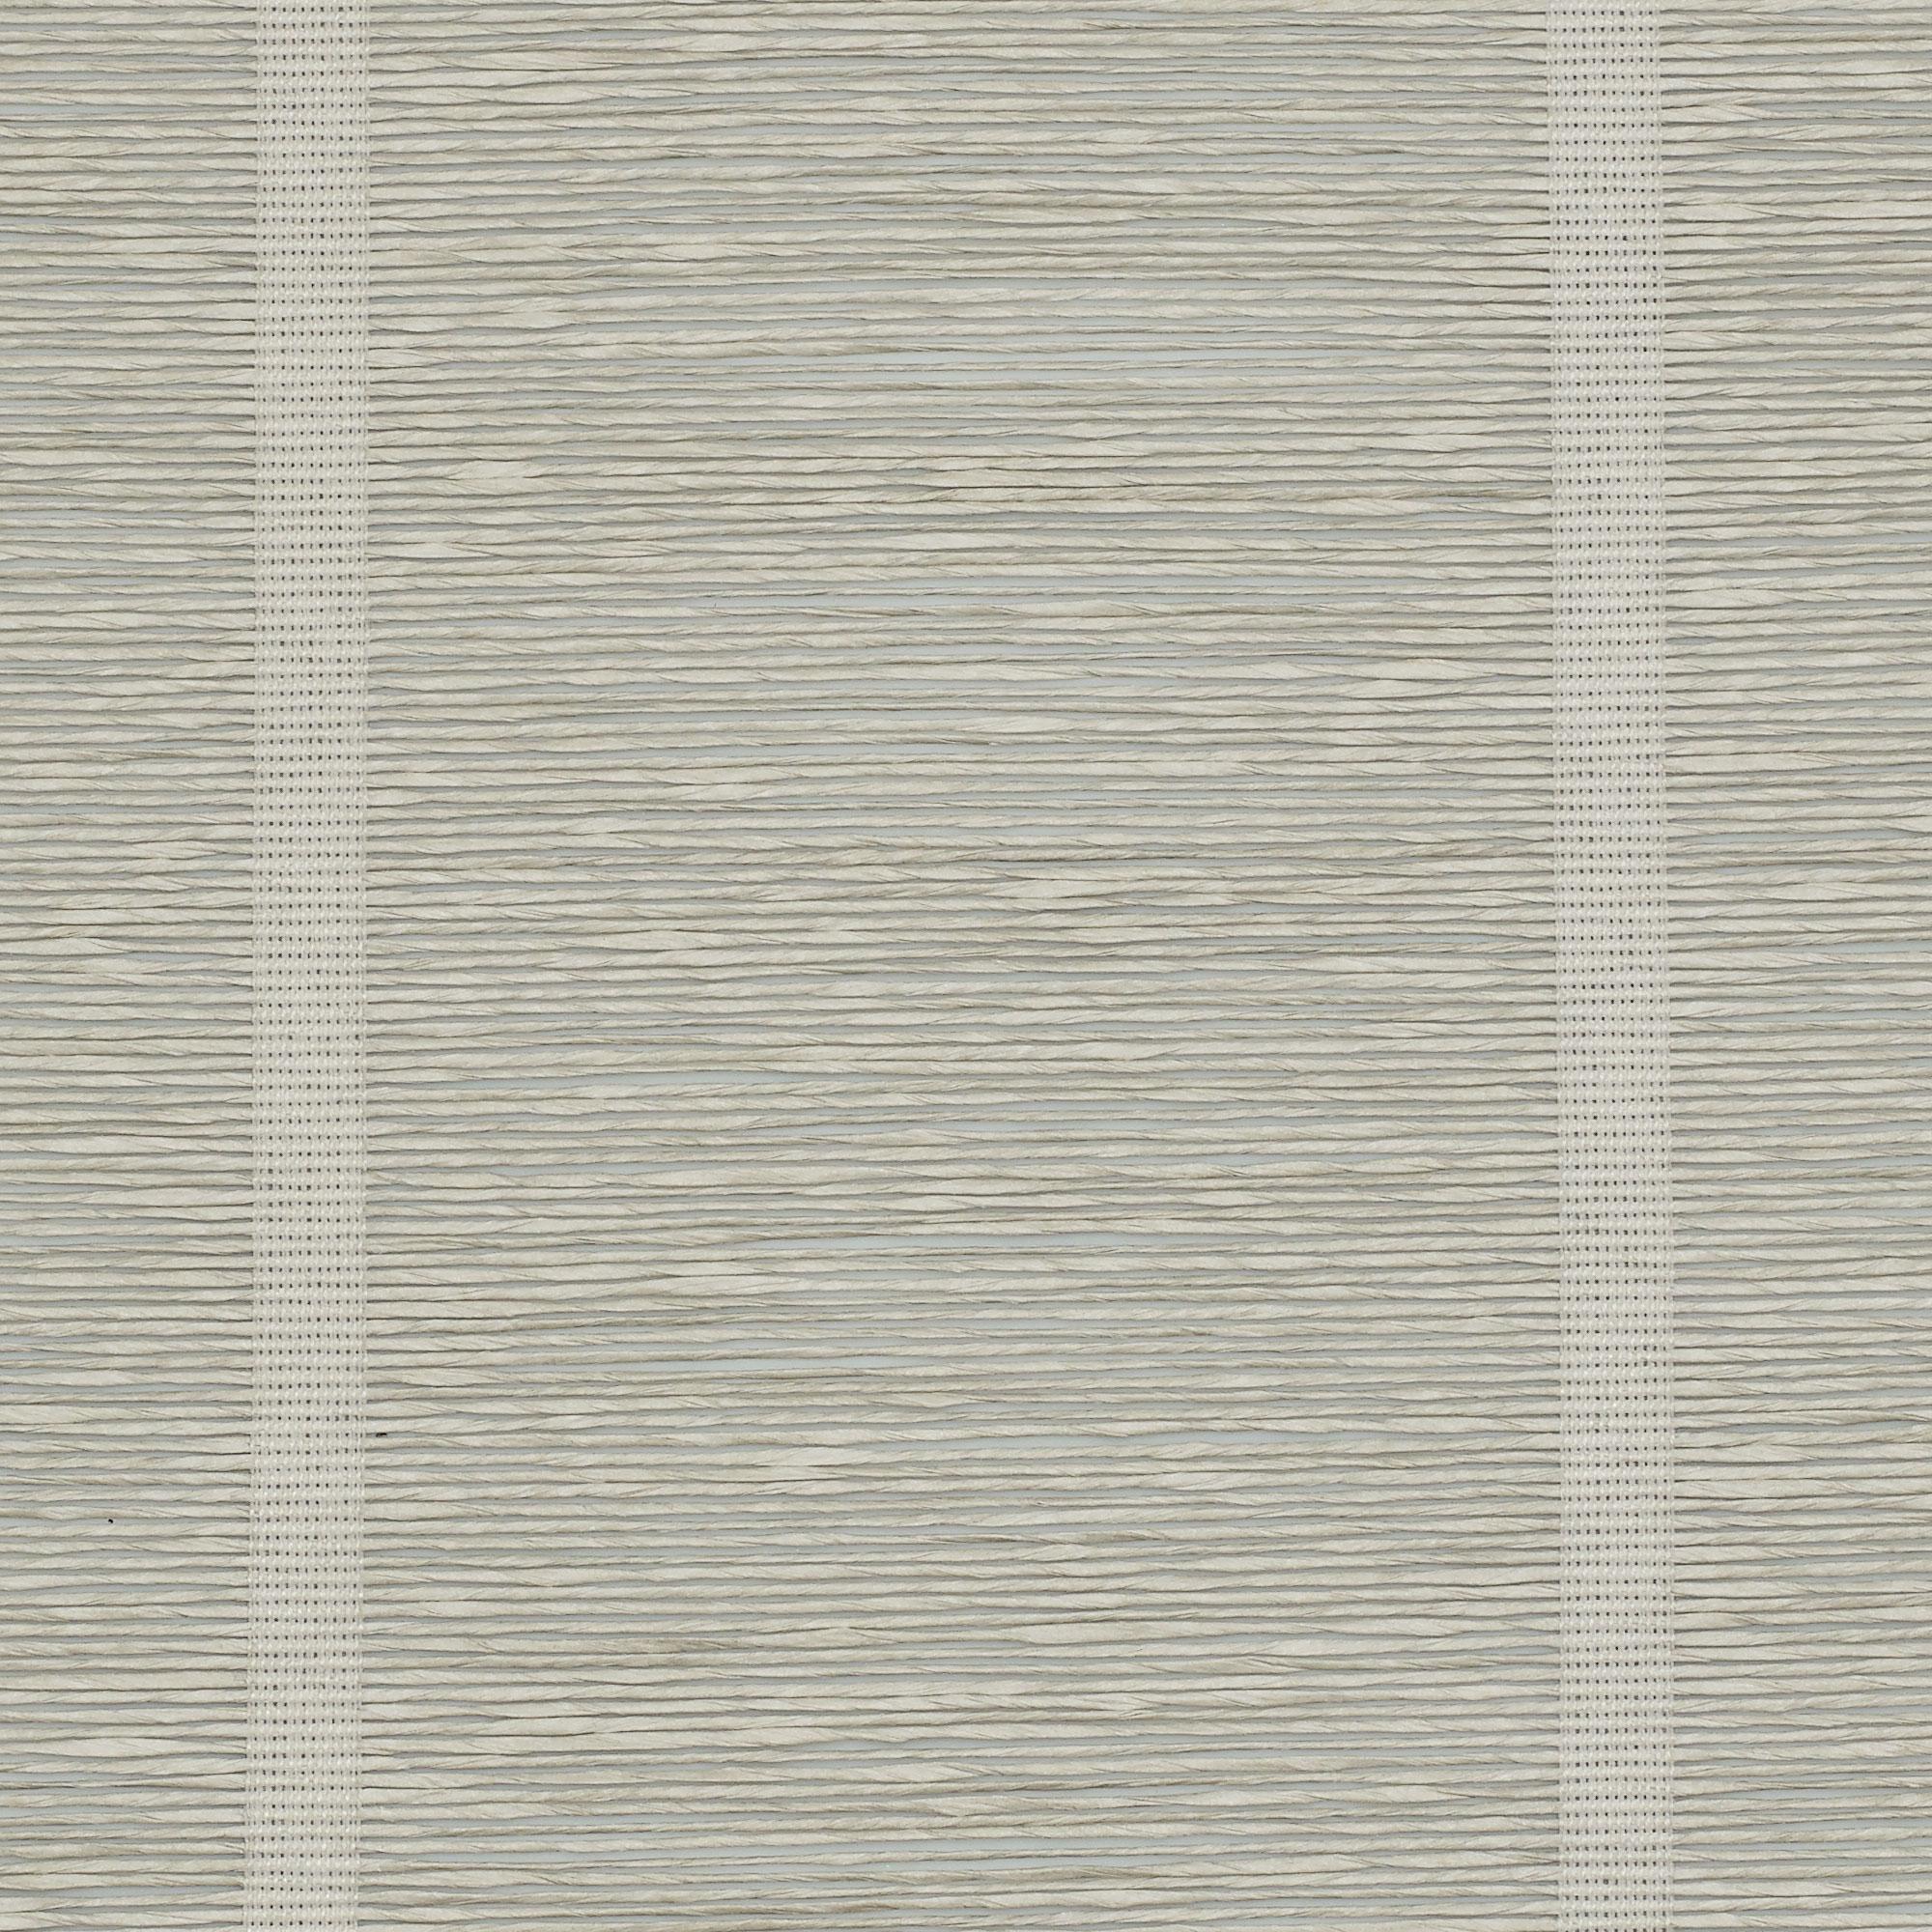 swatch-PW158-36-basketry-dusty-web.jpg